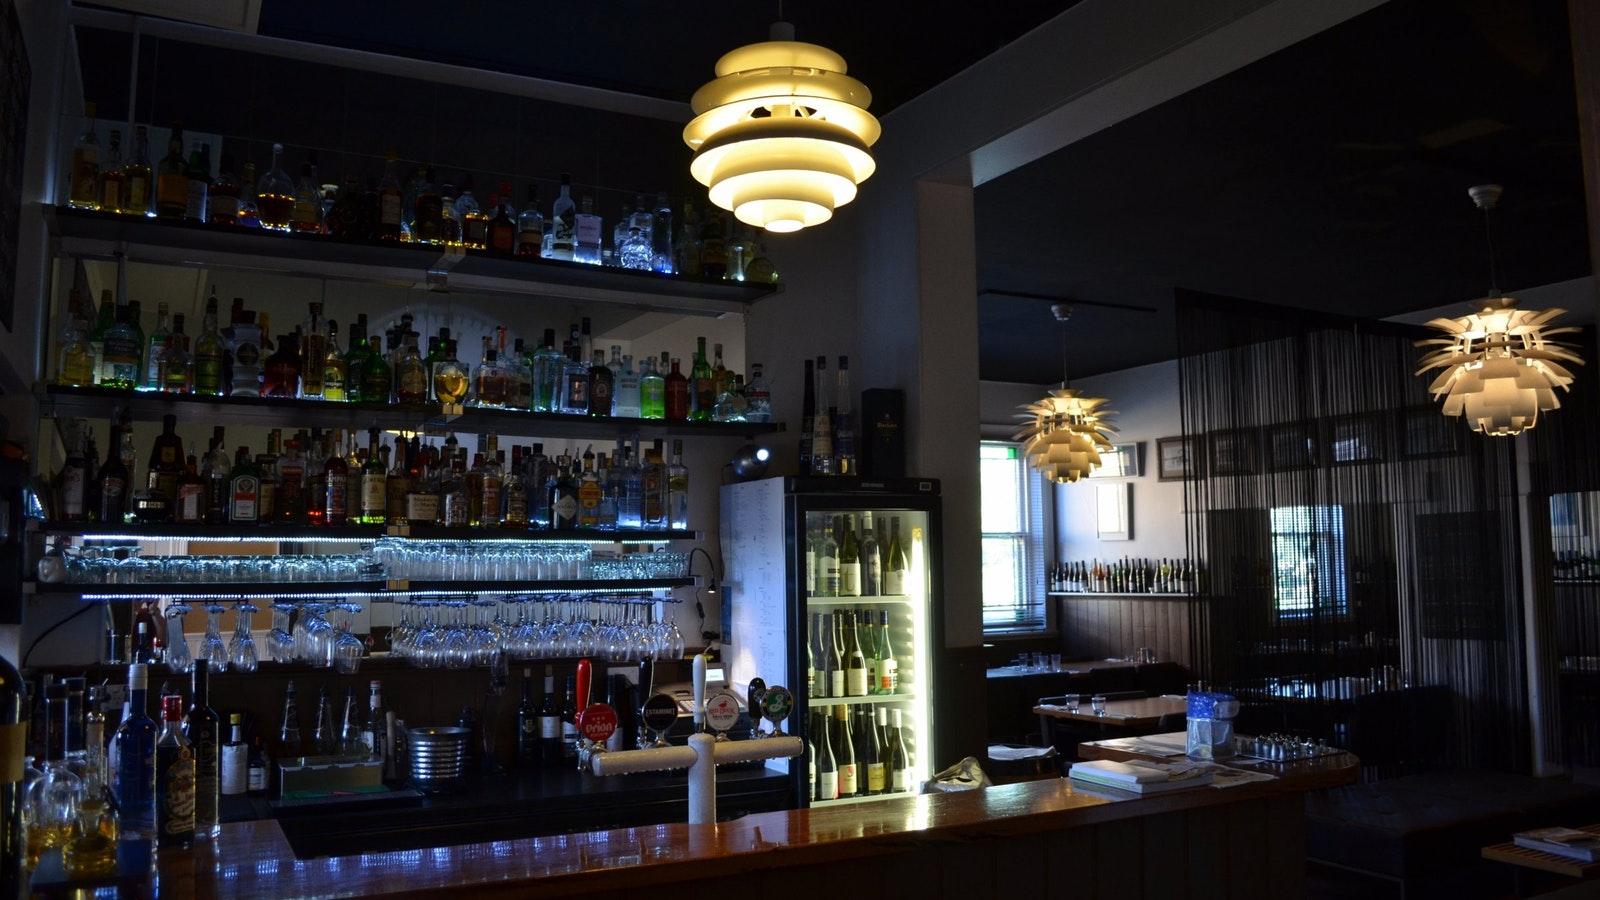 Silk Purse Bar and Dining Room